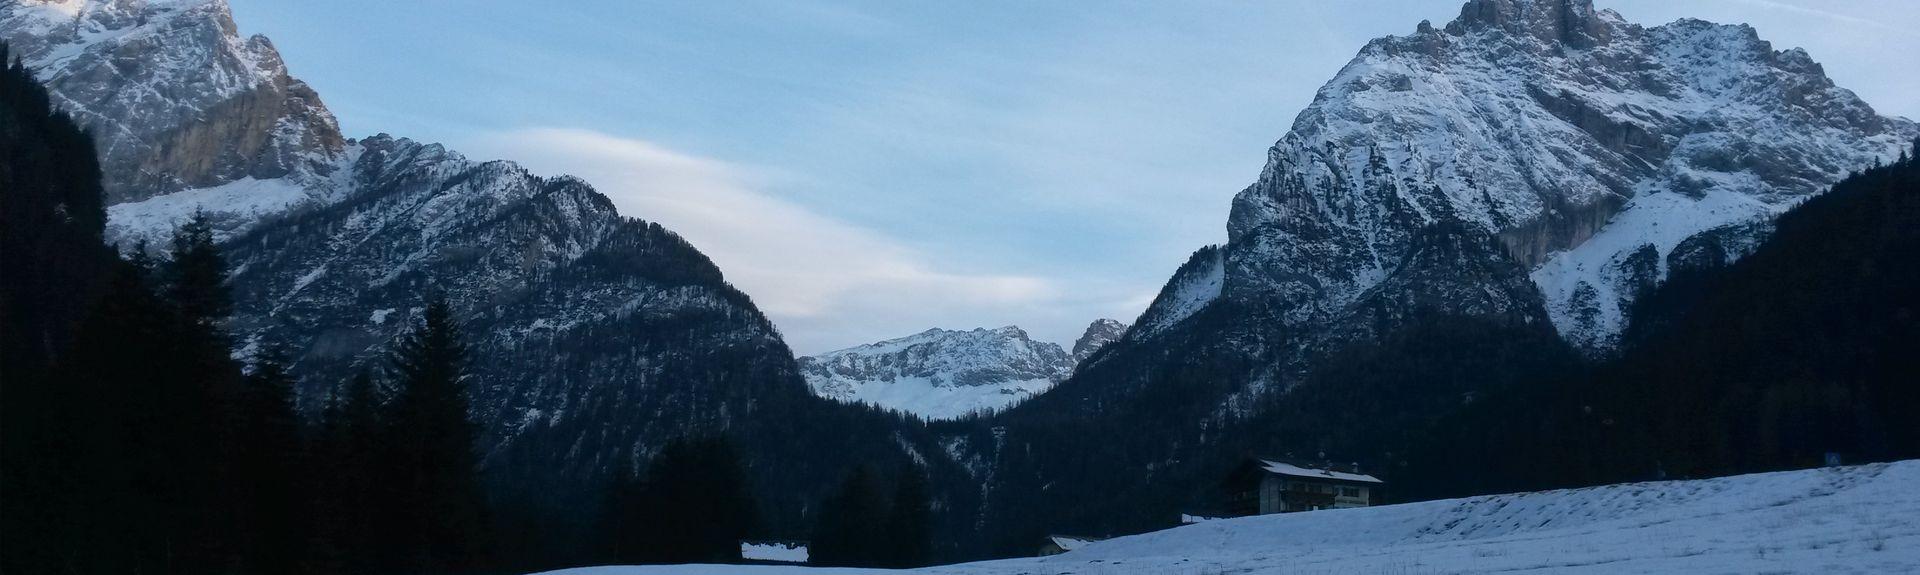 Ortisei-Furnes Gondola, Ortisei, Trentino-Alto Adige, Italy